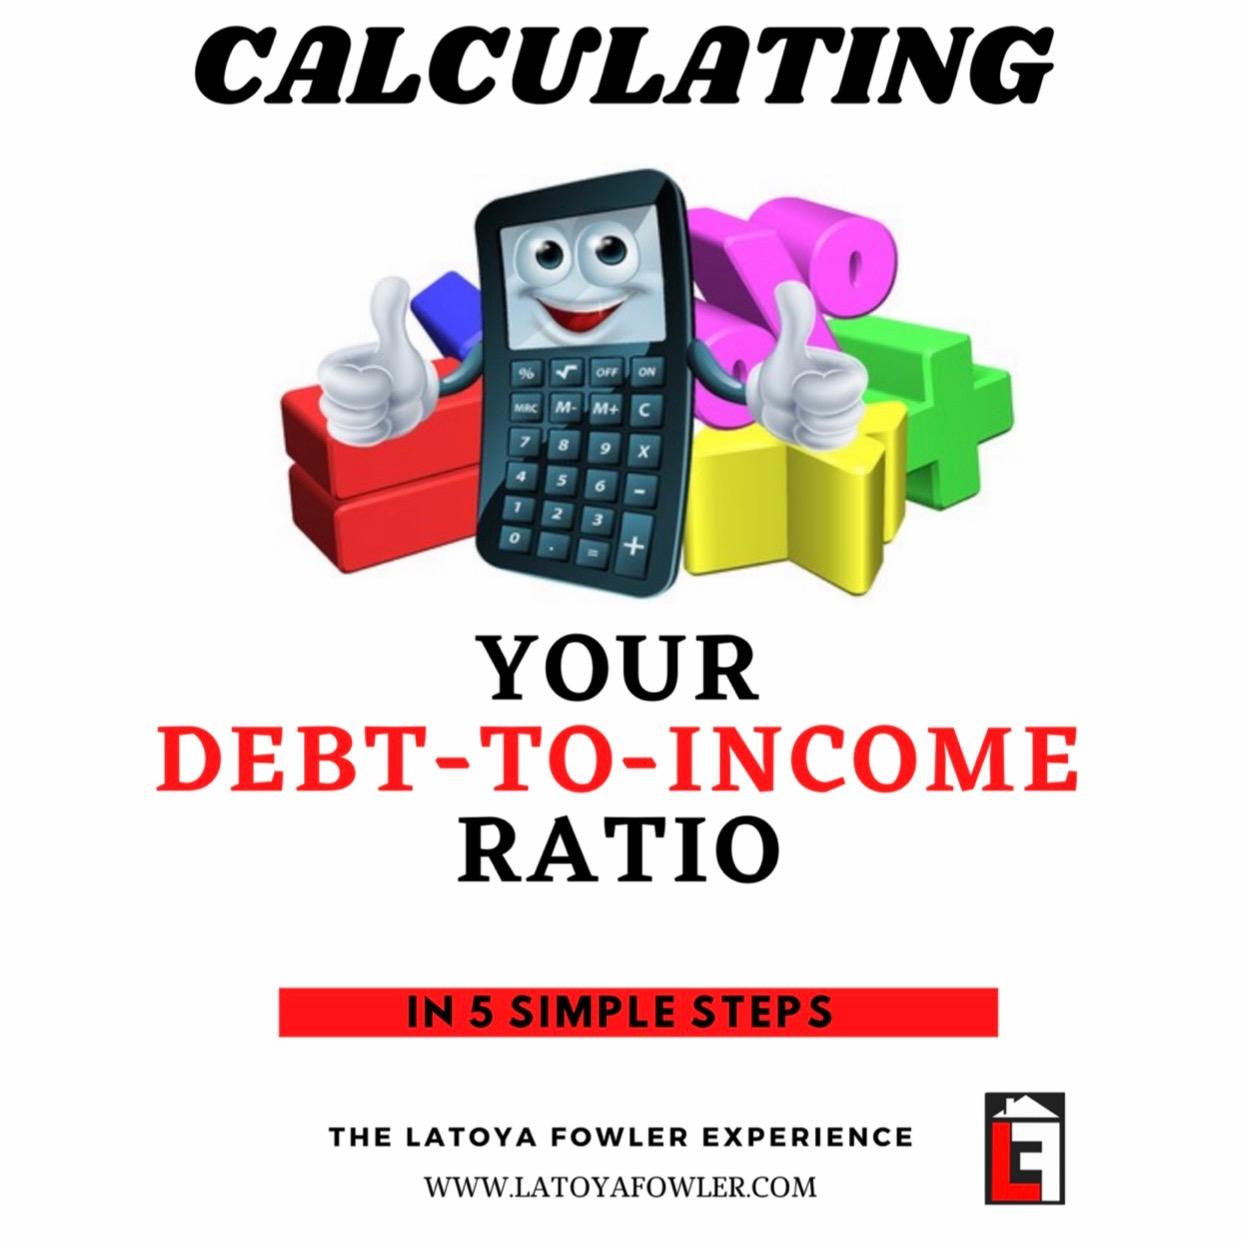 E-Workbook: Calculating your Debt-to-Income Ratio